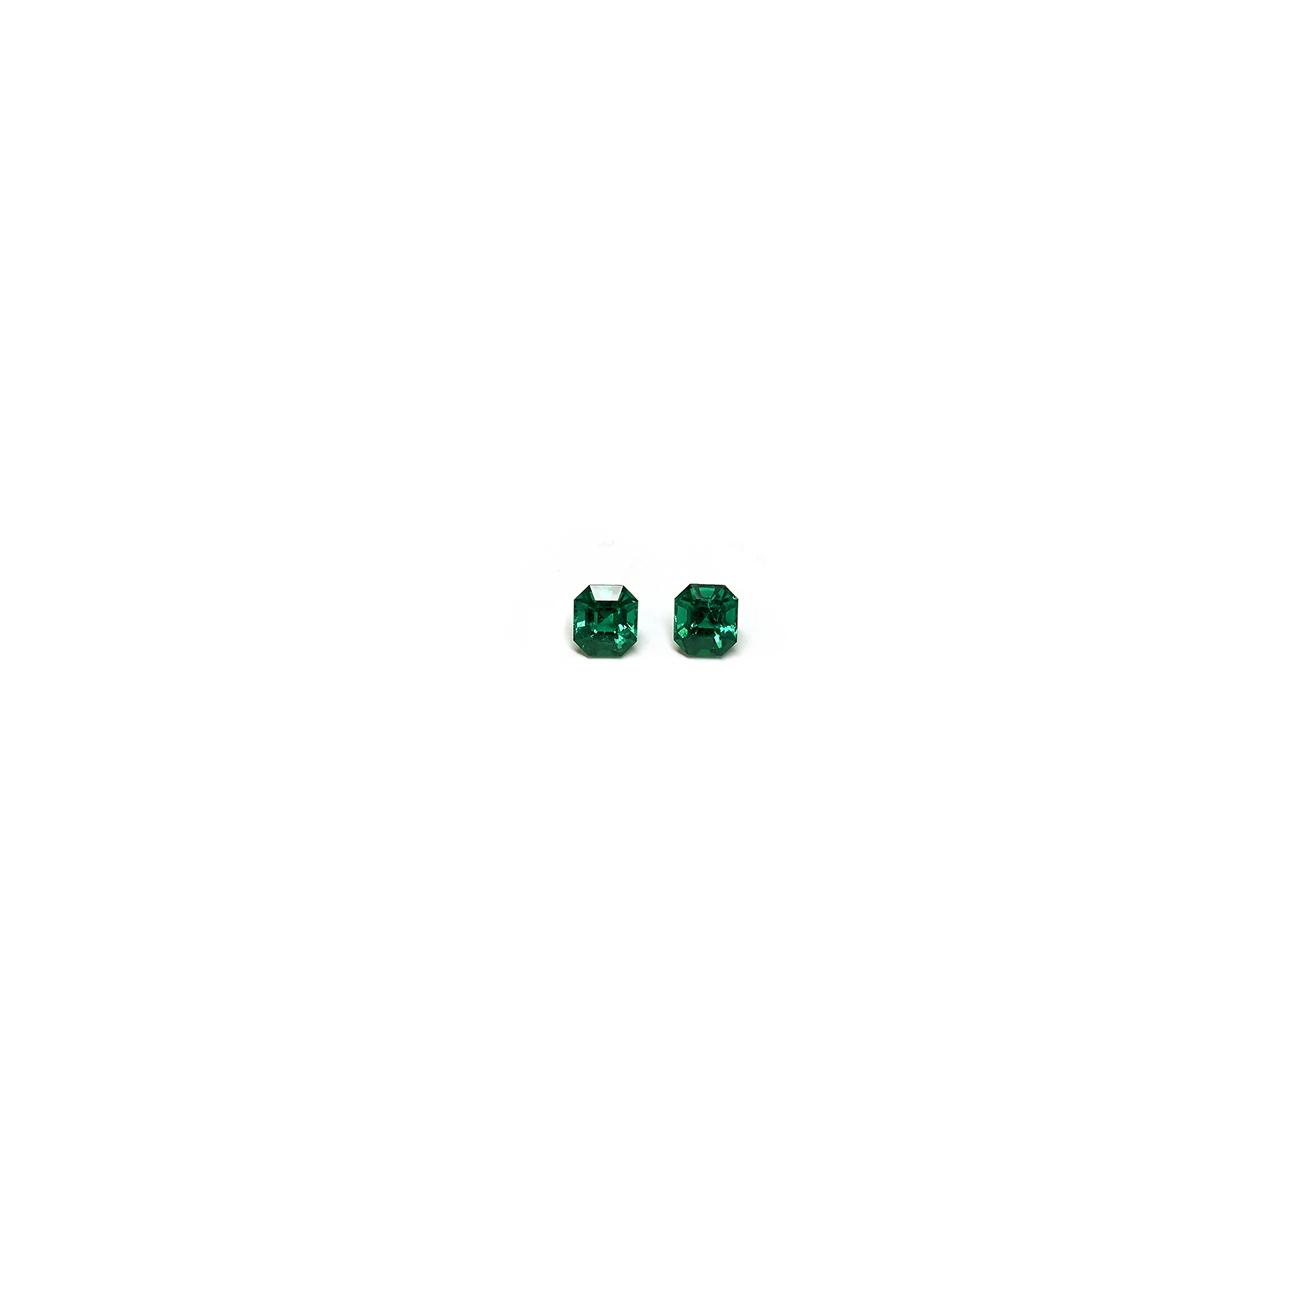 4 carat emerald cut pair